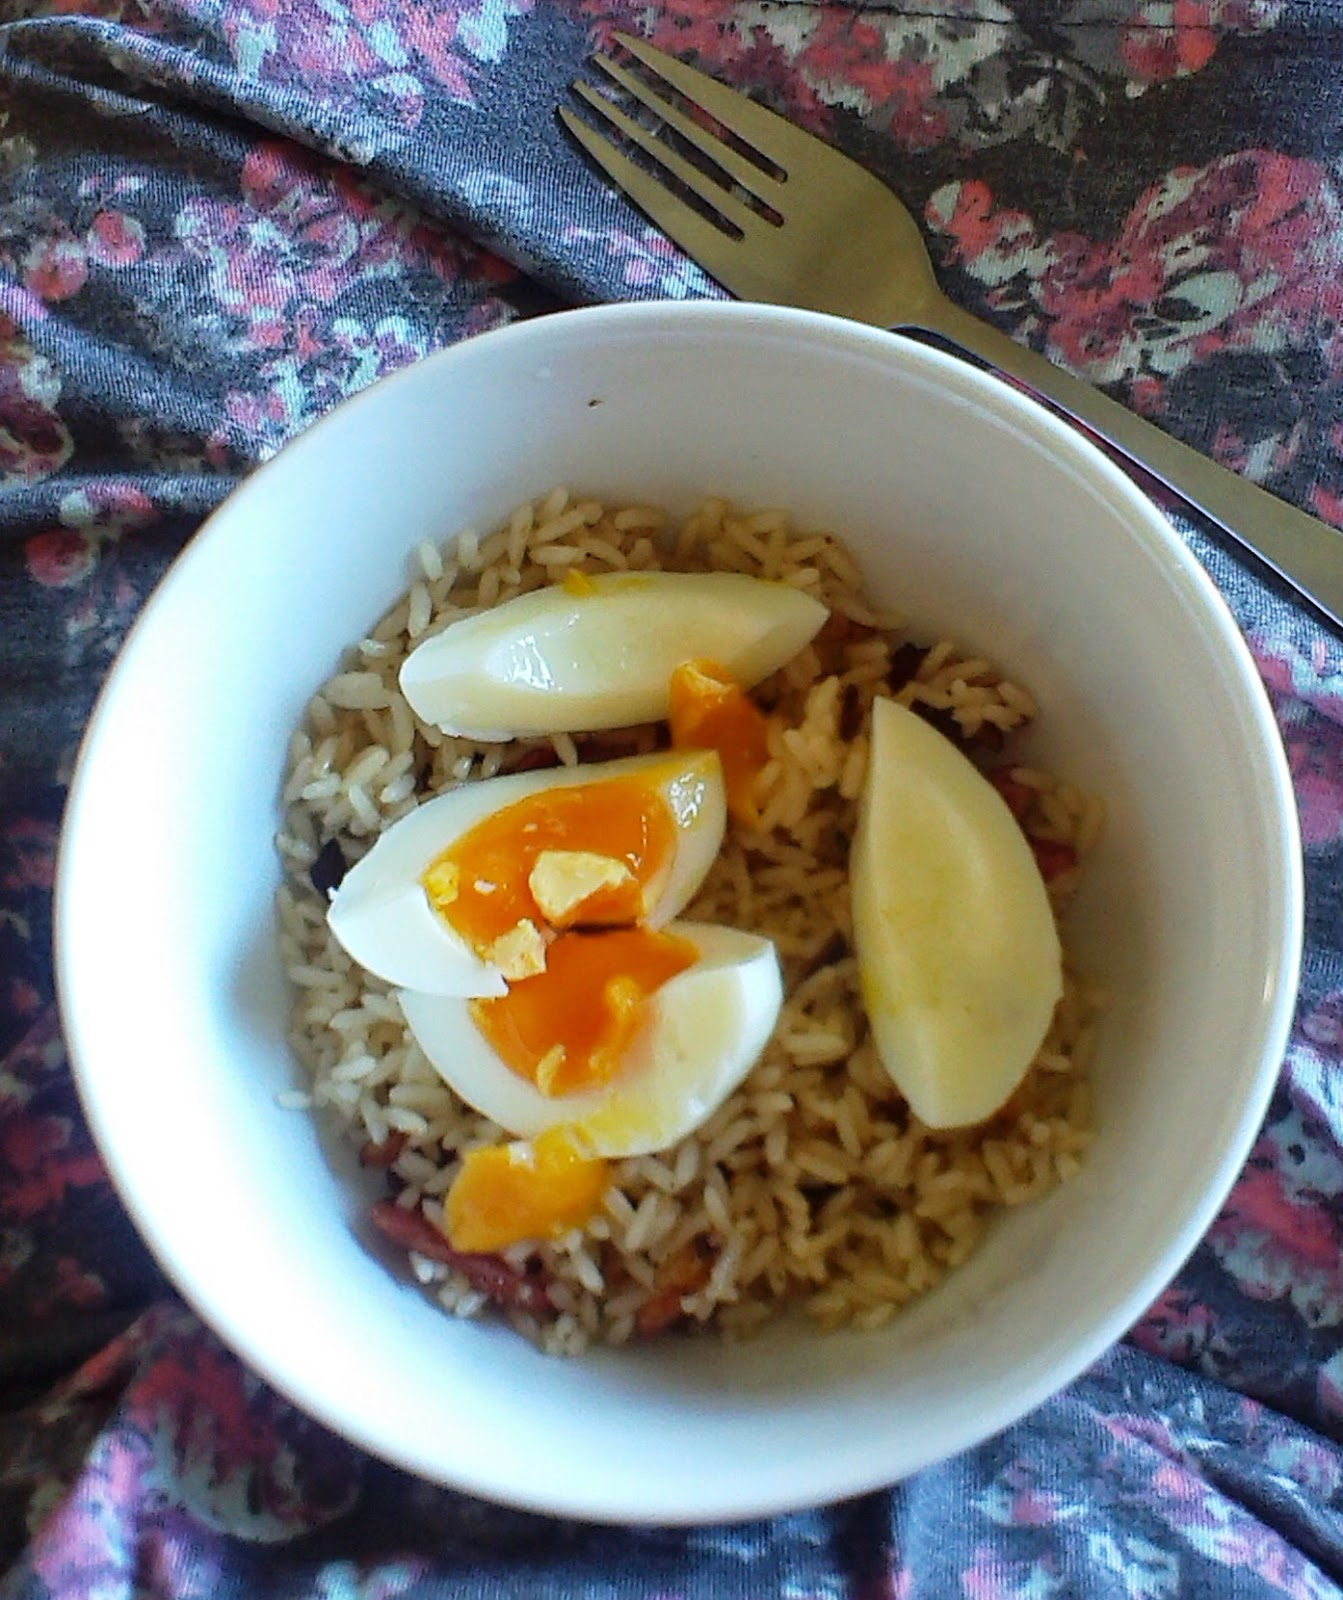 Bacon and Eggs Kedgeree-style